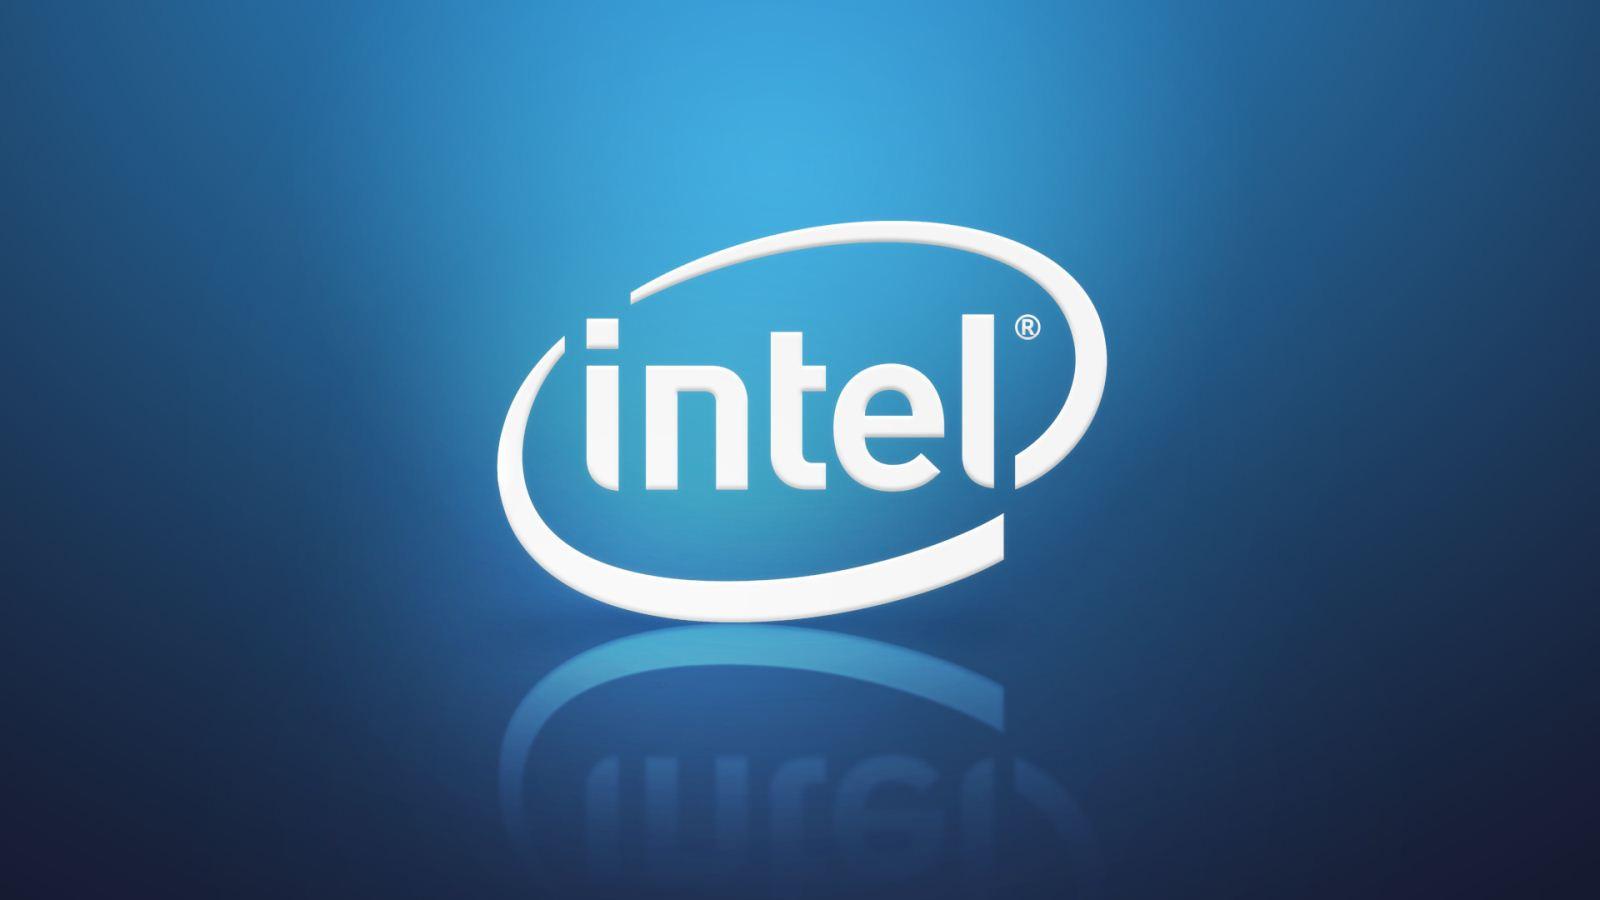 intel第11代酷睿再次曝光!8核16线程,最高主频4.3GHz!